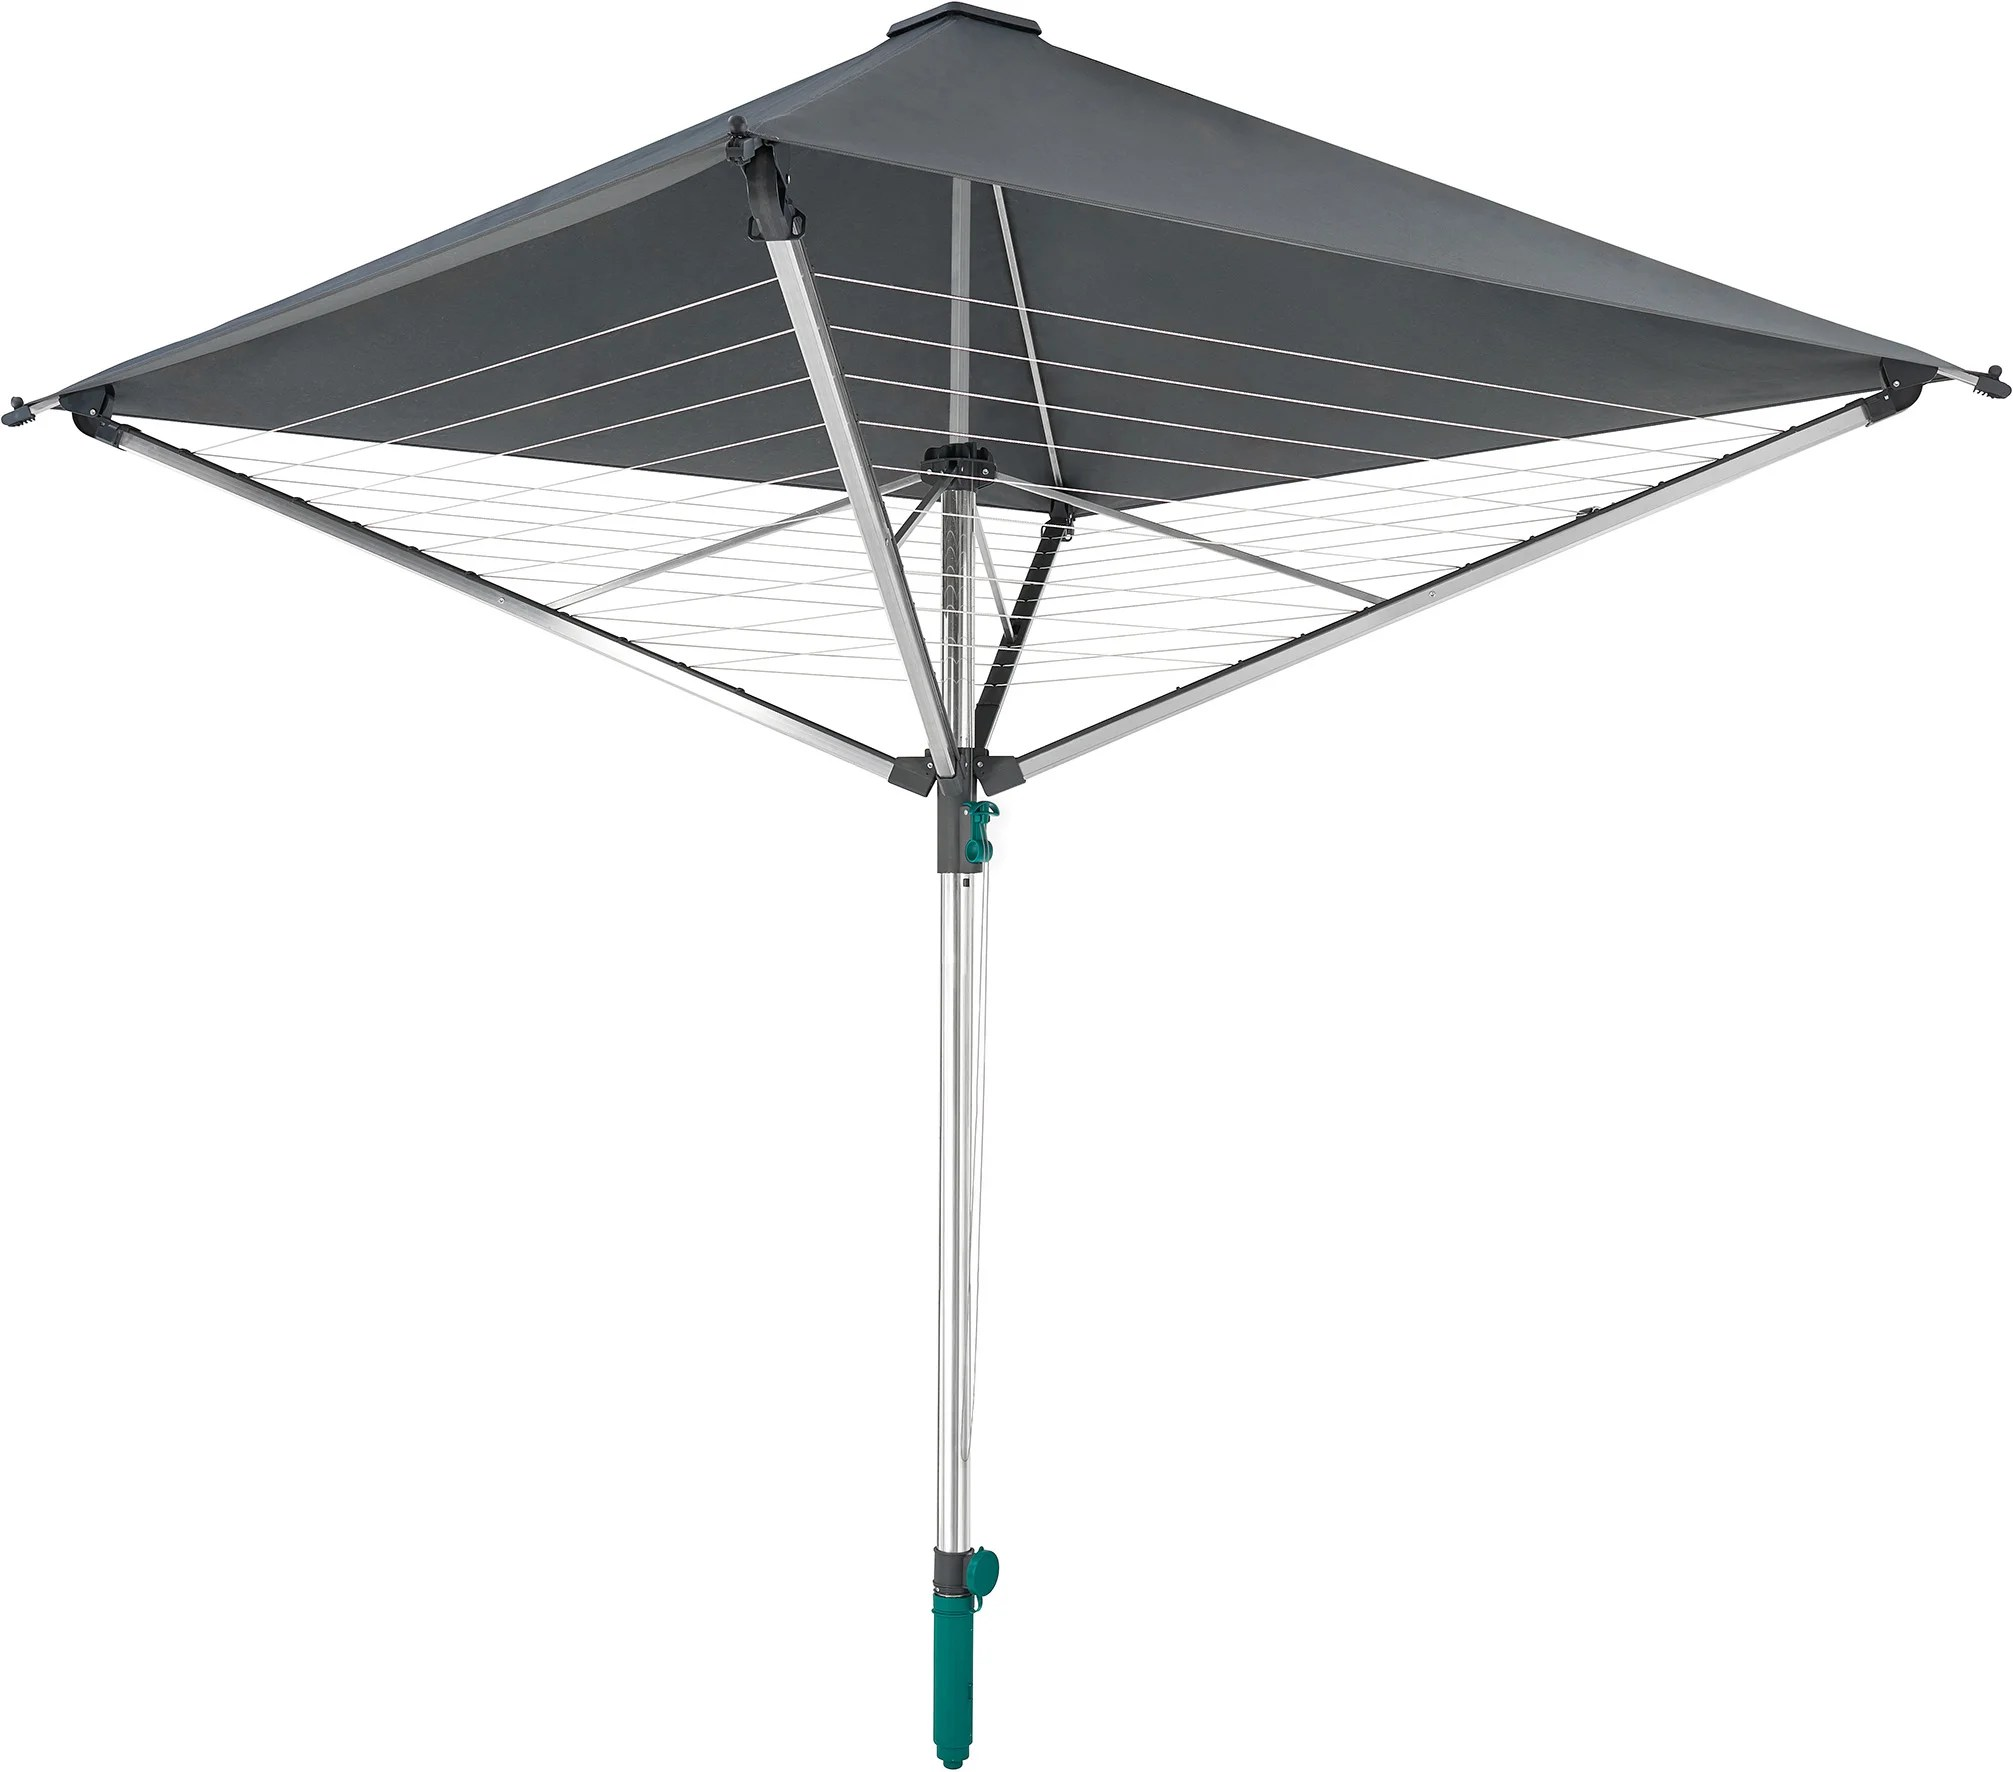 Etendoir Sechoir Parapluie Exterieur Leroy Merlin